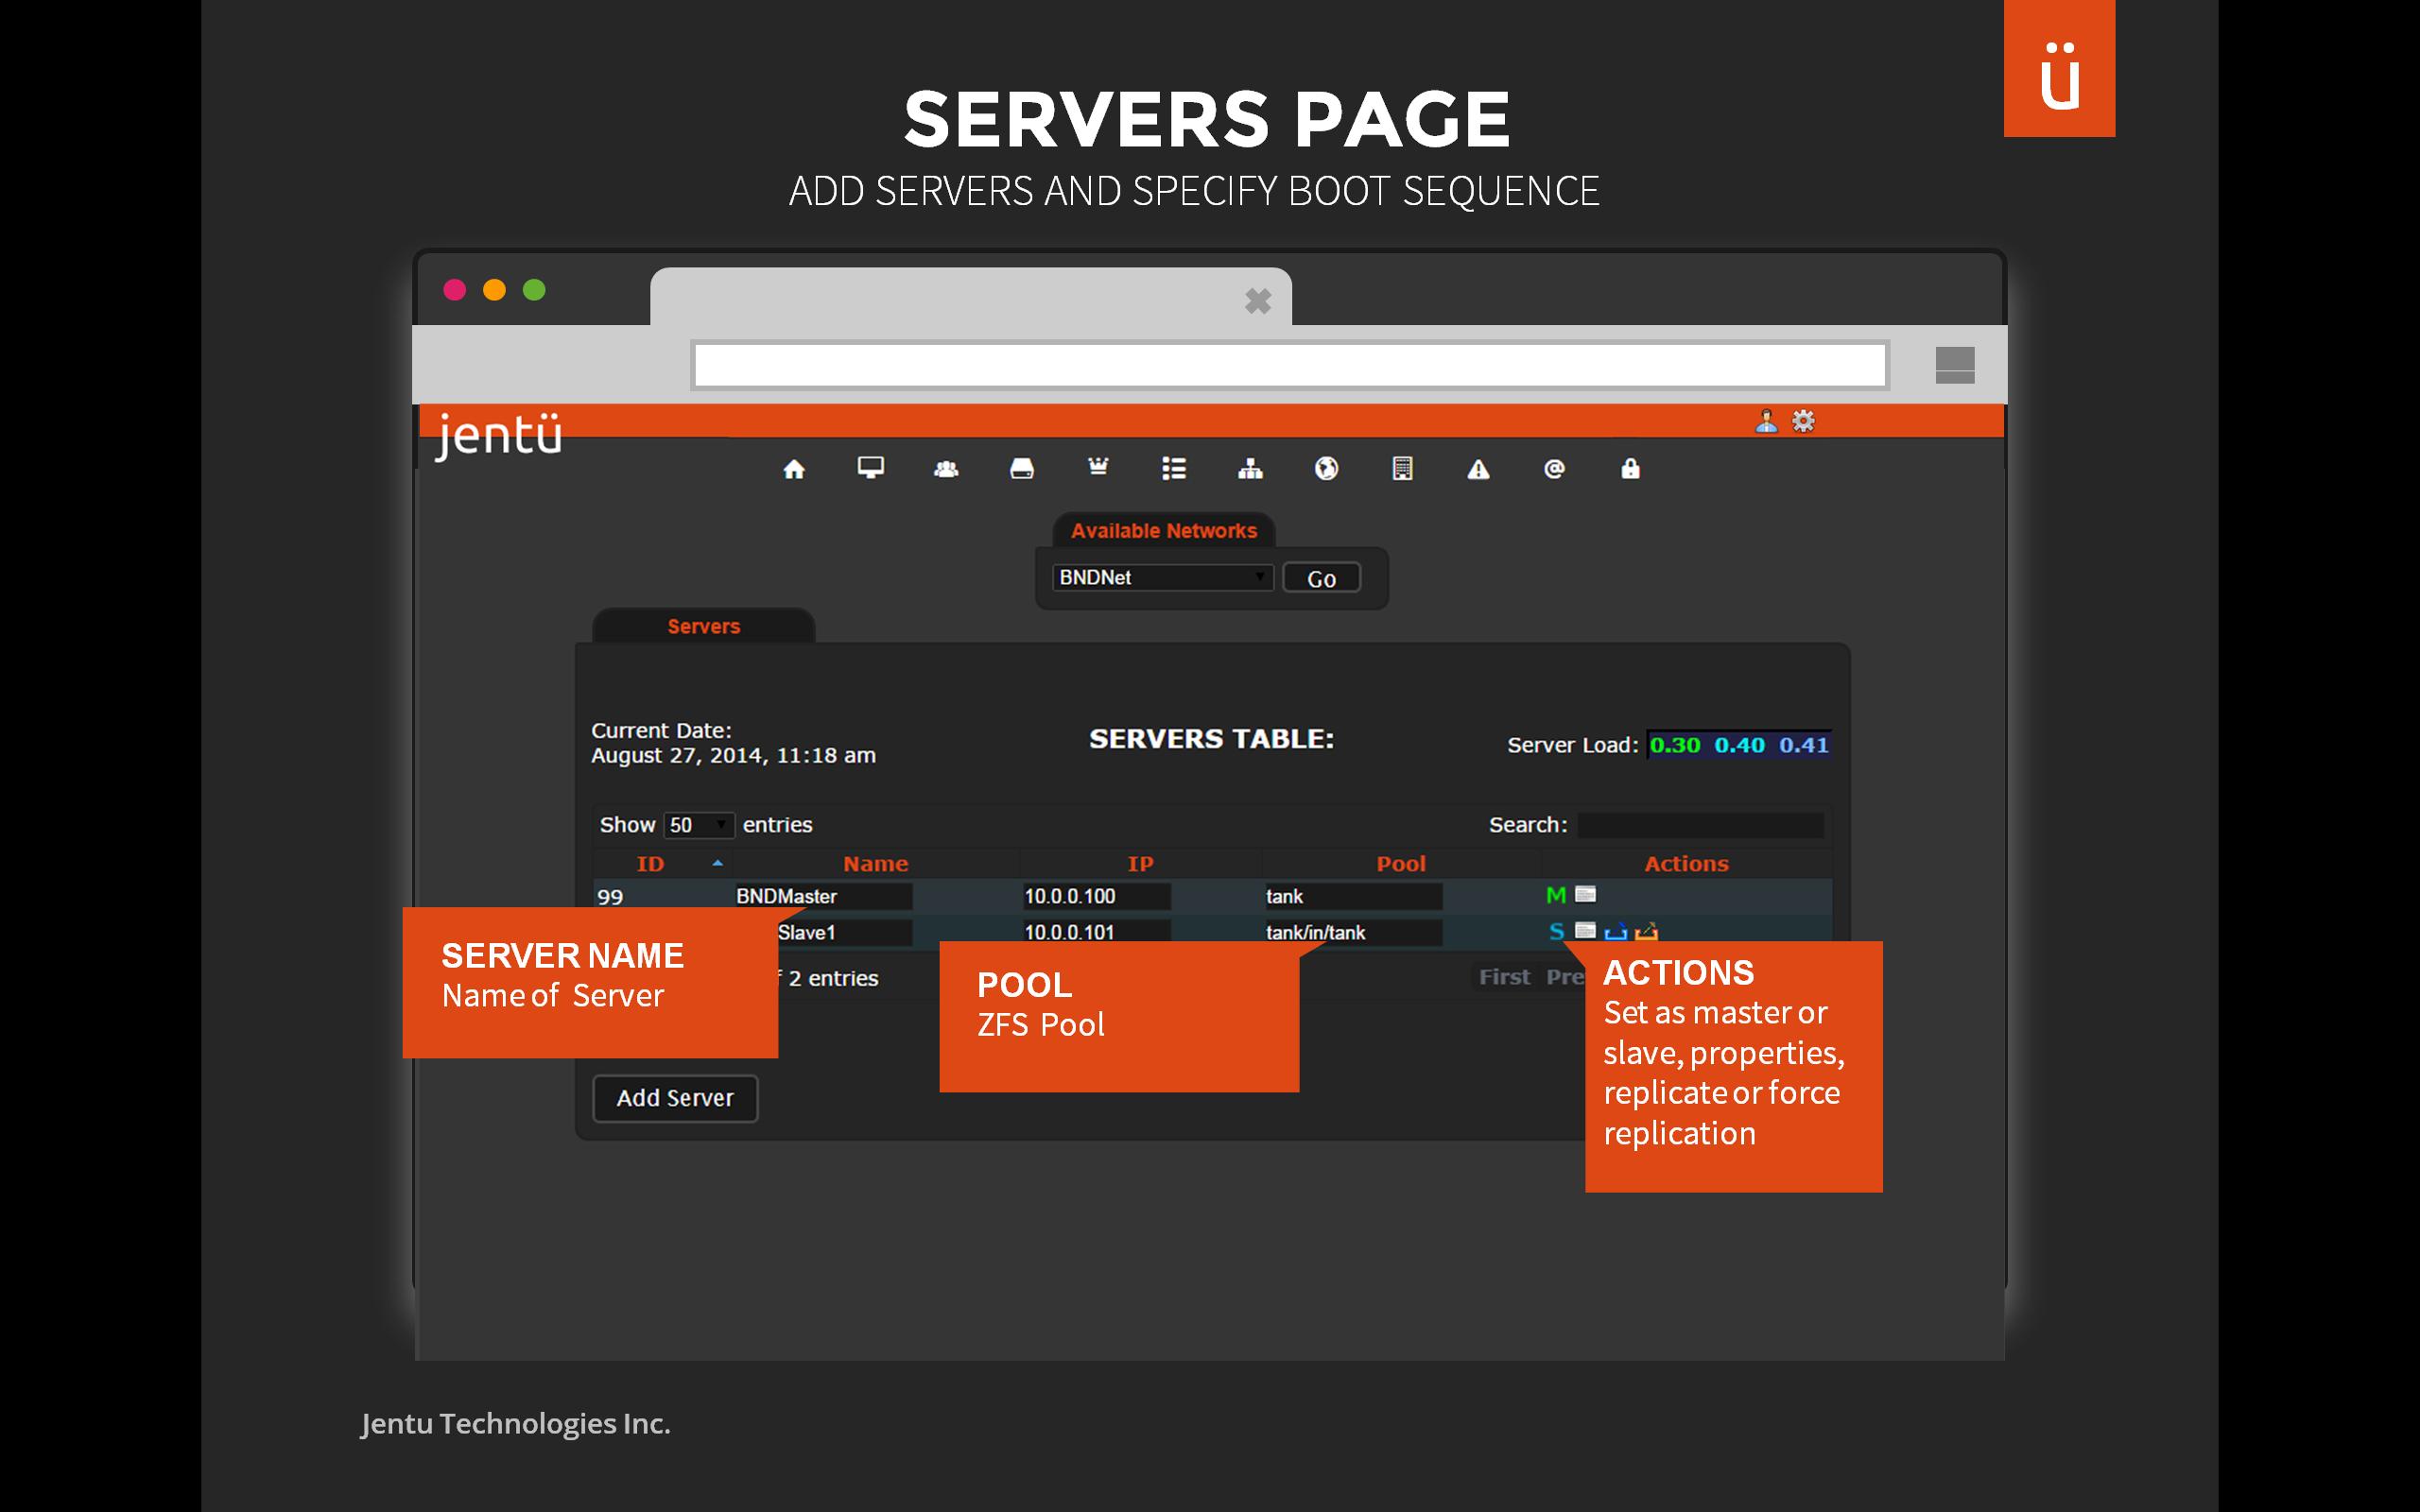 serverspage